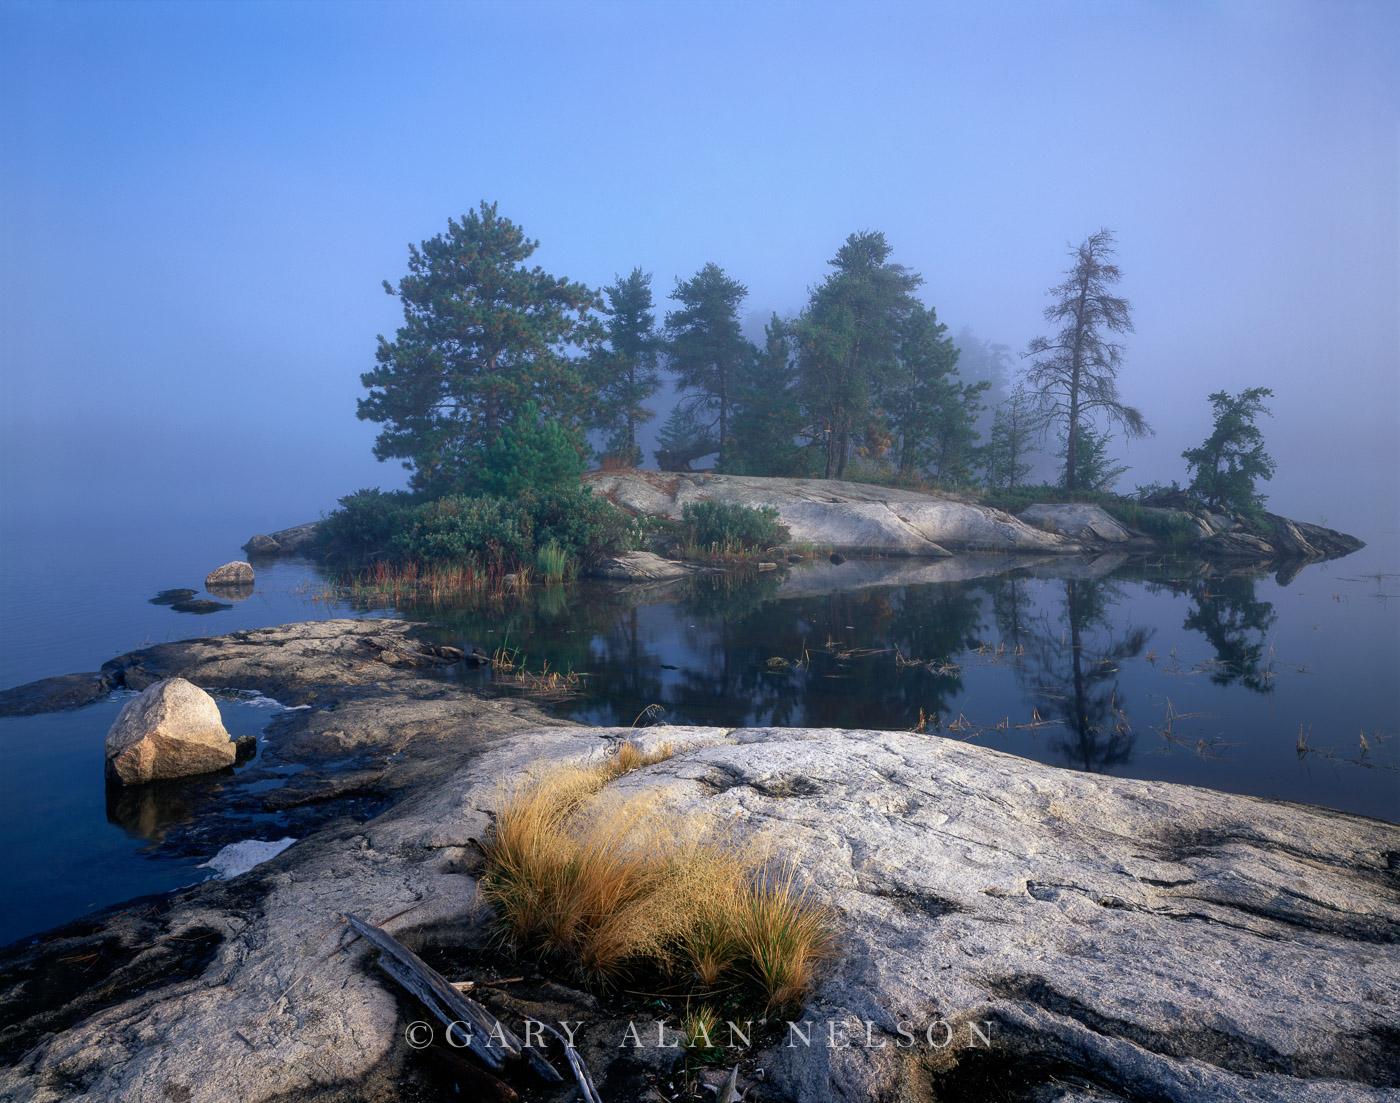 MN-97-126-NP Smooth granite islands on foggy morning, Sand Point Lake, Voyageurs National Park, Minnesota